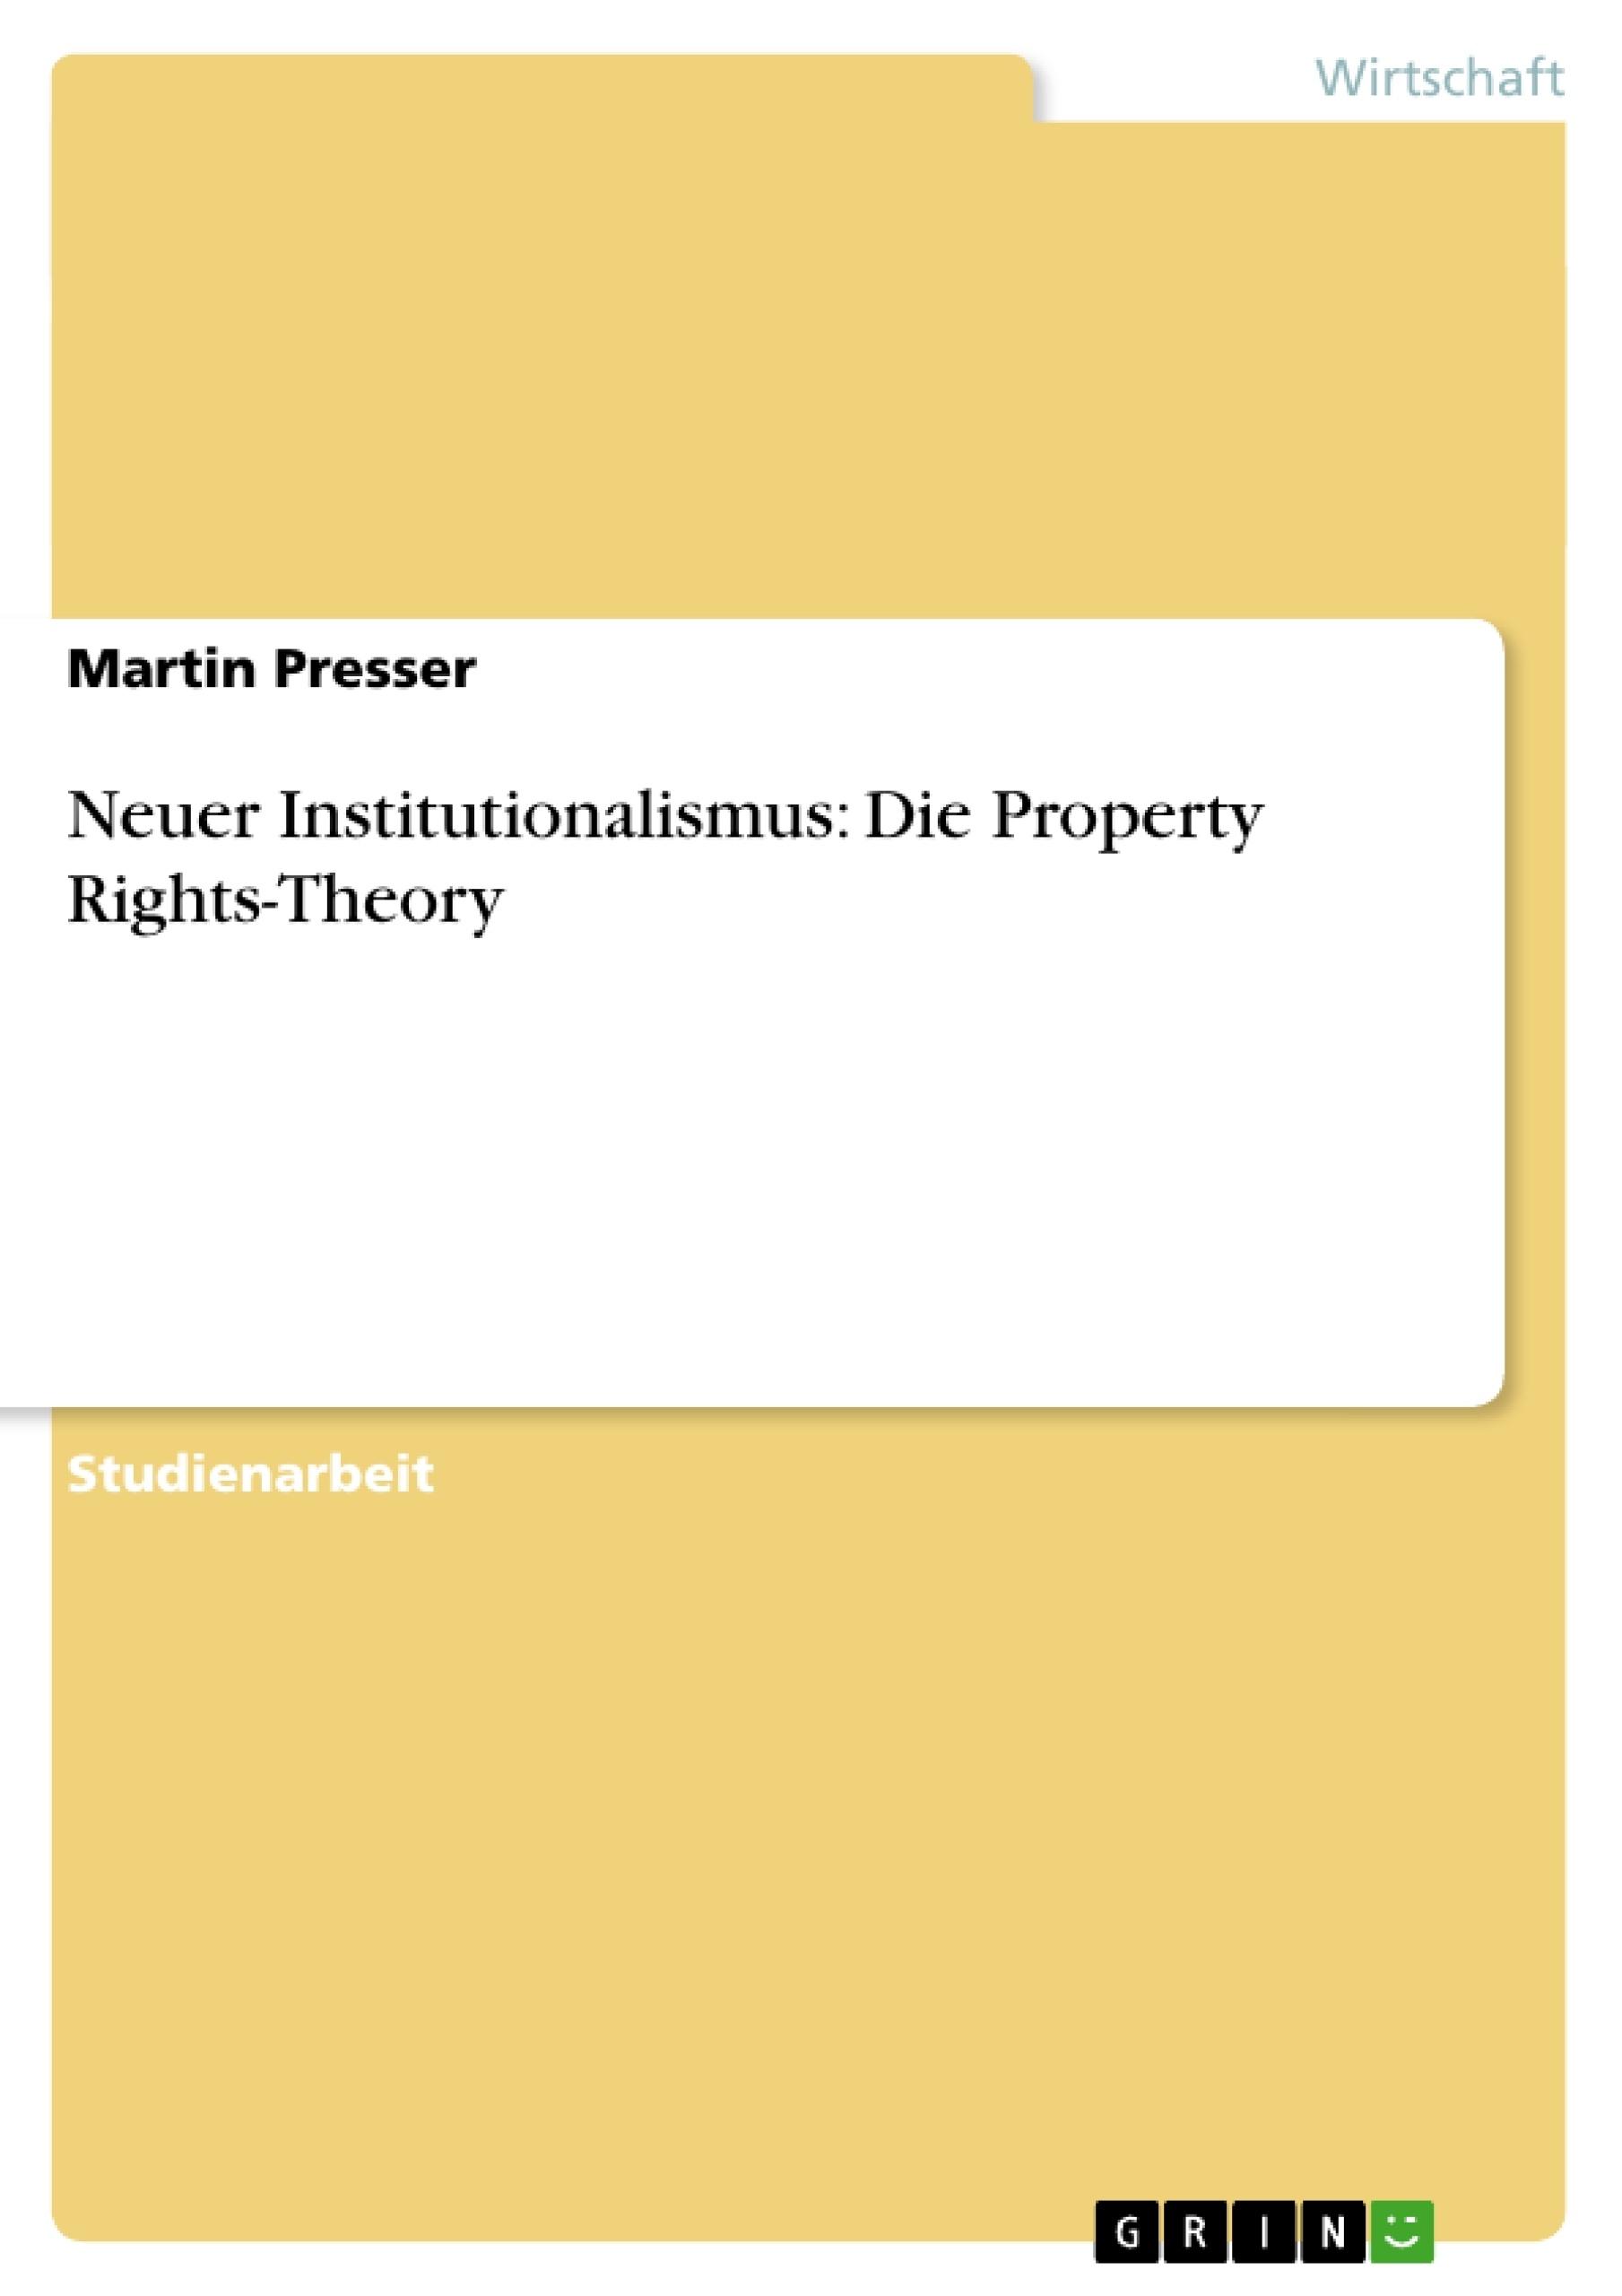 Titel: Neuer Institutionalismus: Die Property Rights-Theory